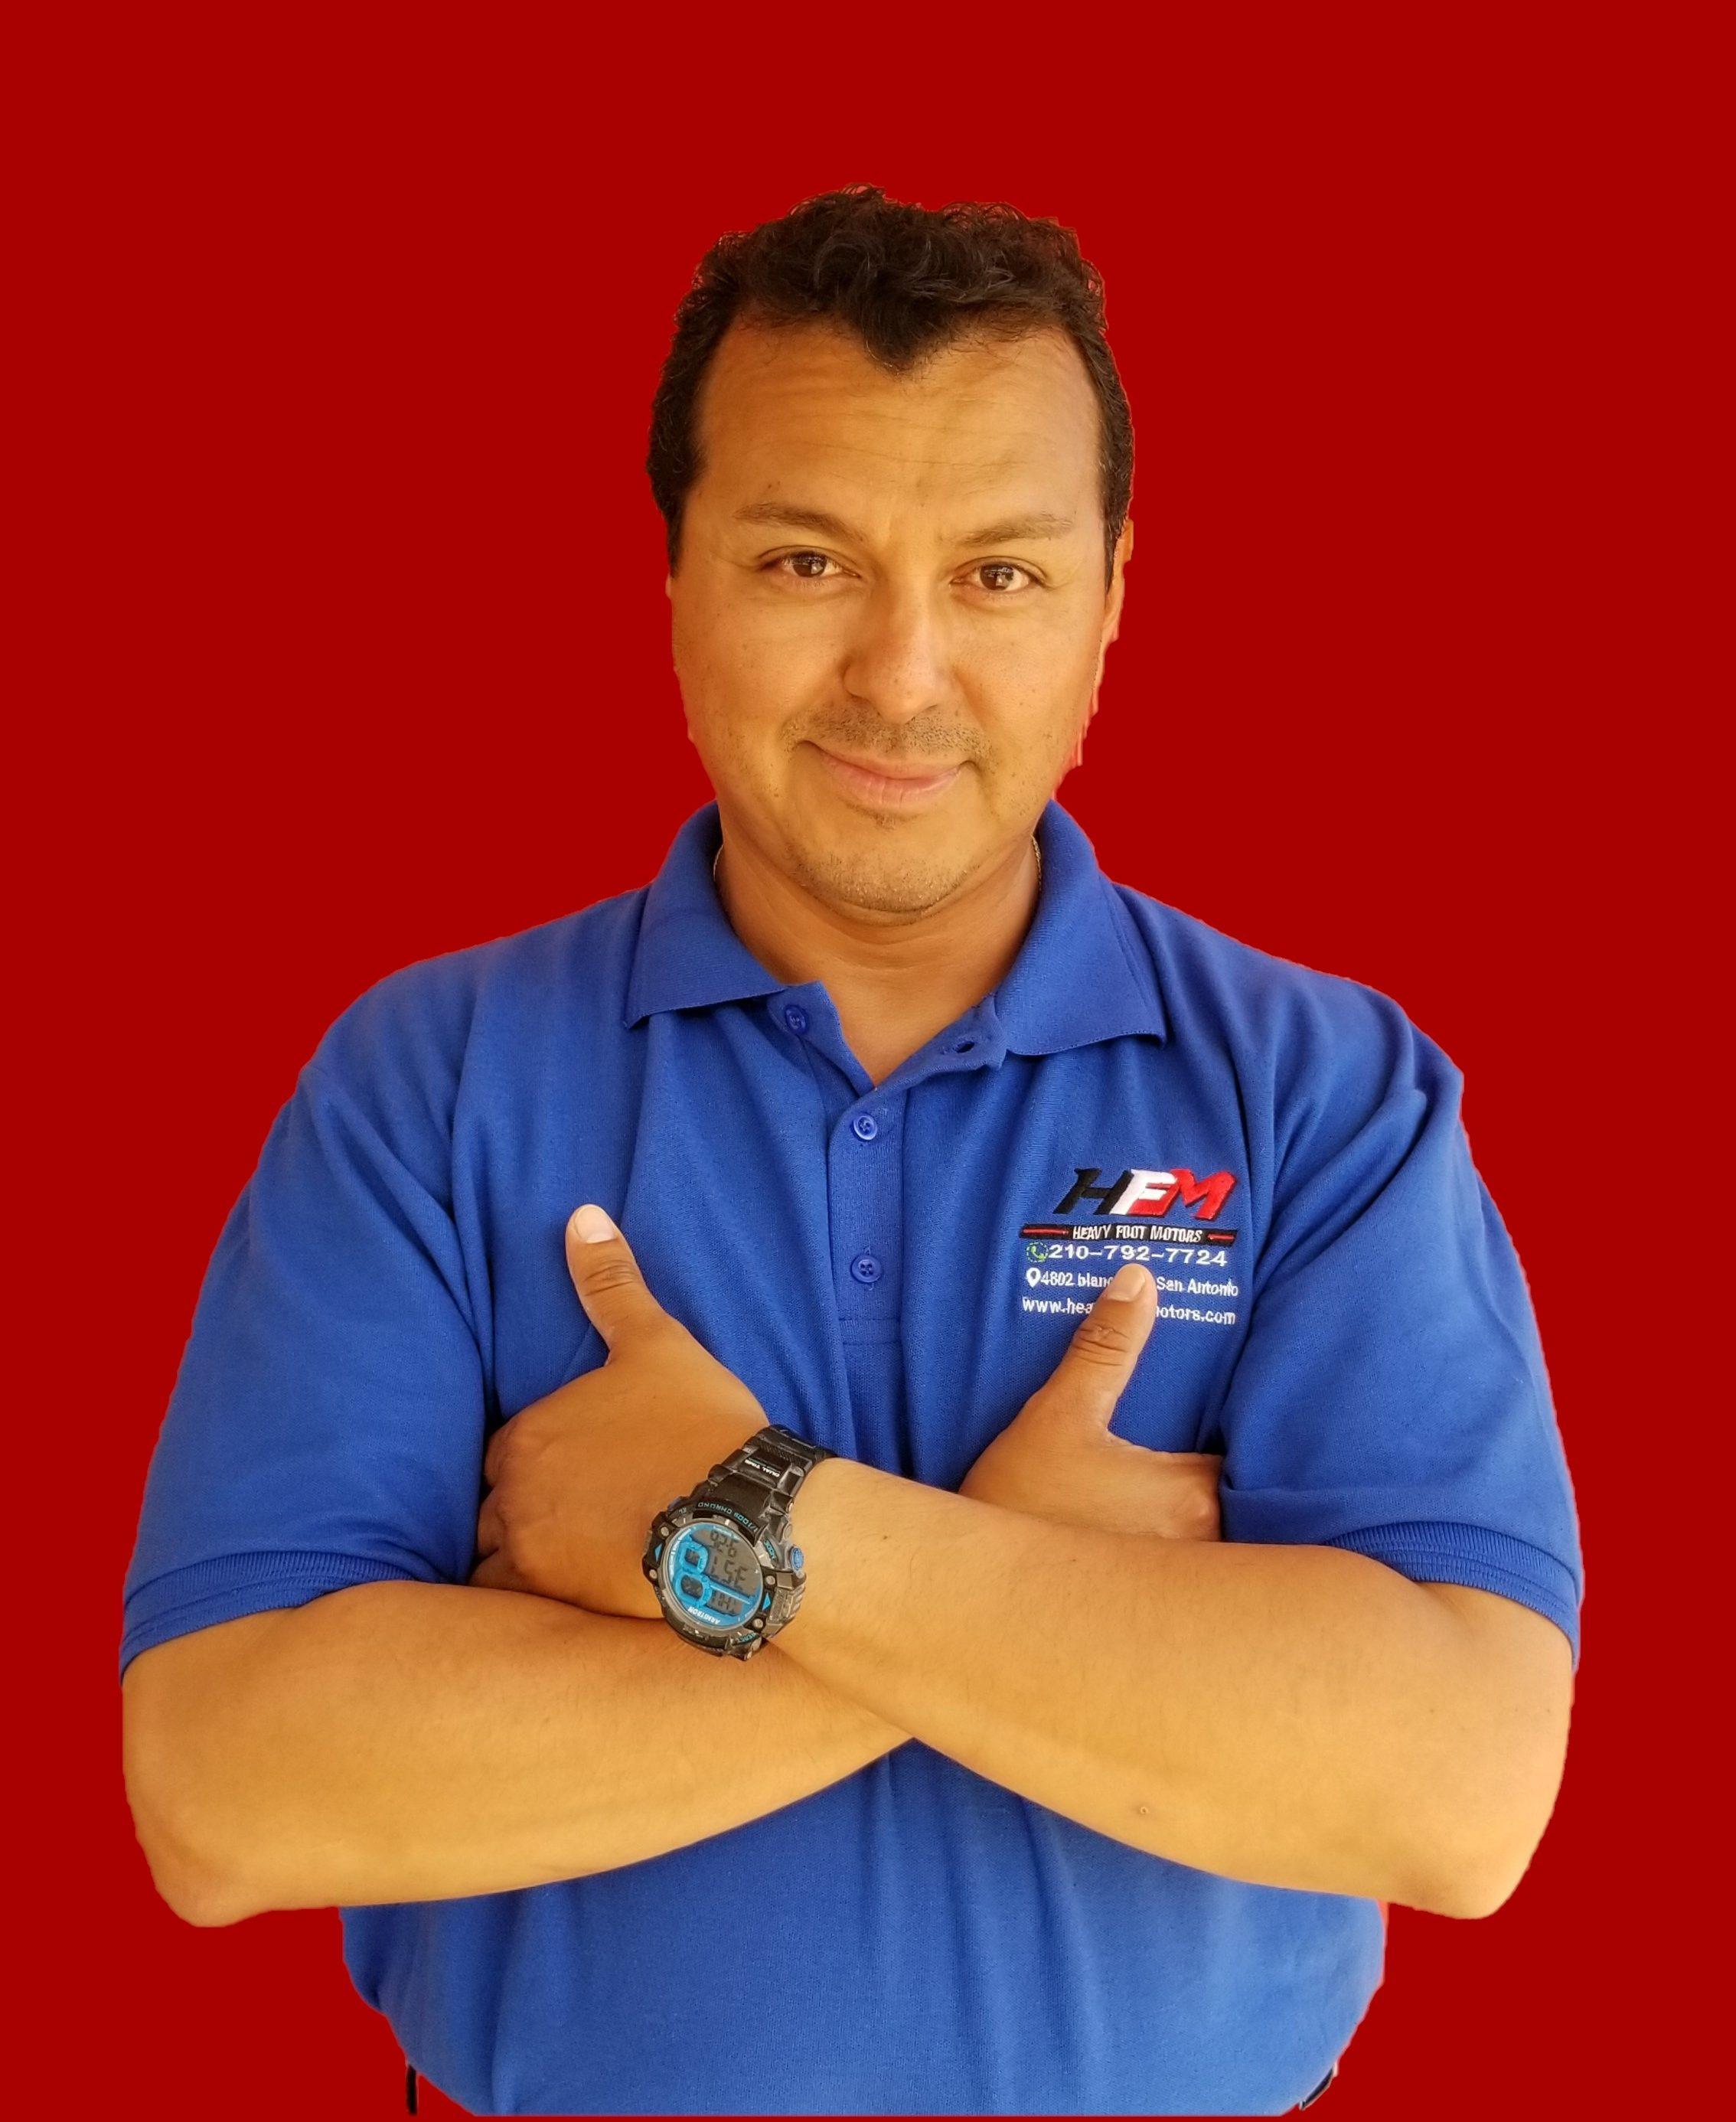 Franscisco Hernandez